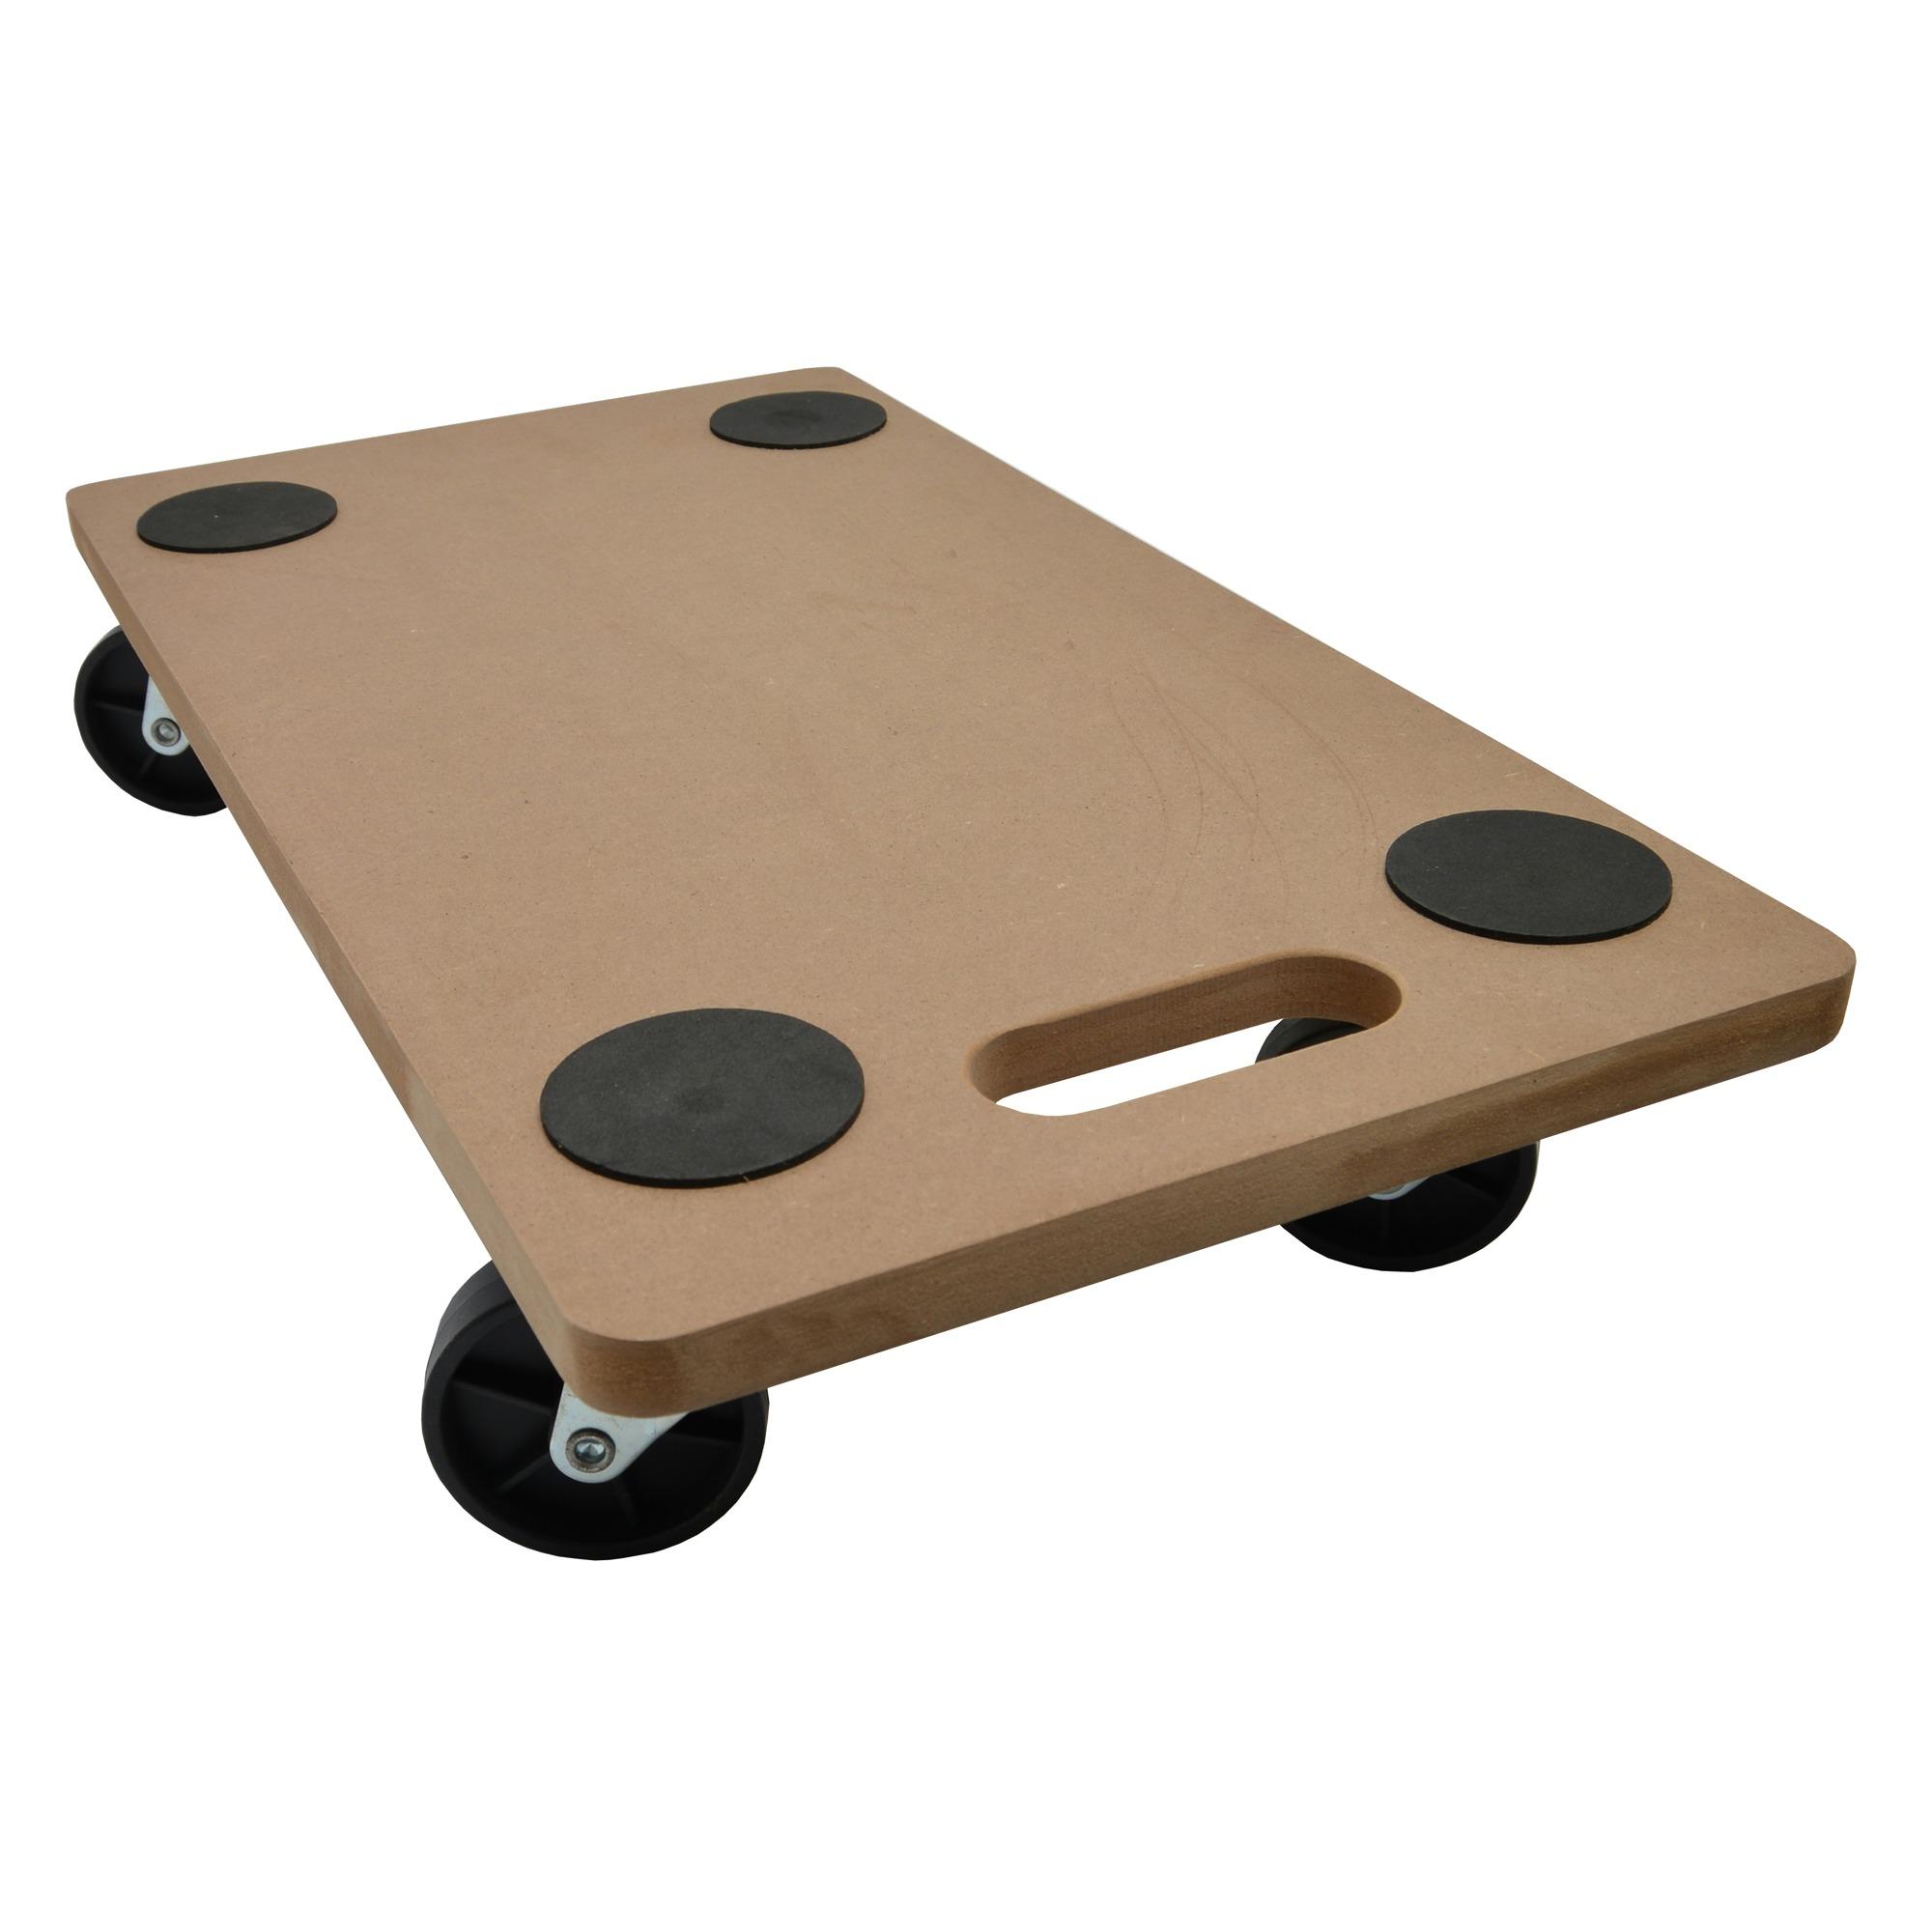 Handson meubeltransporter mdf 56×30 cm met harde wielen en anti-slip (max. 200 kg)